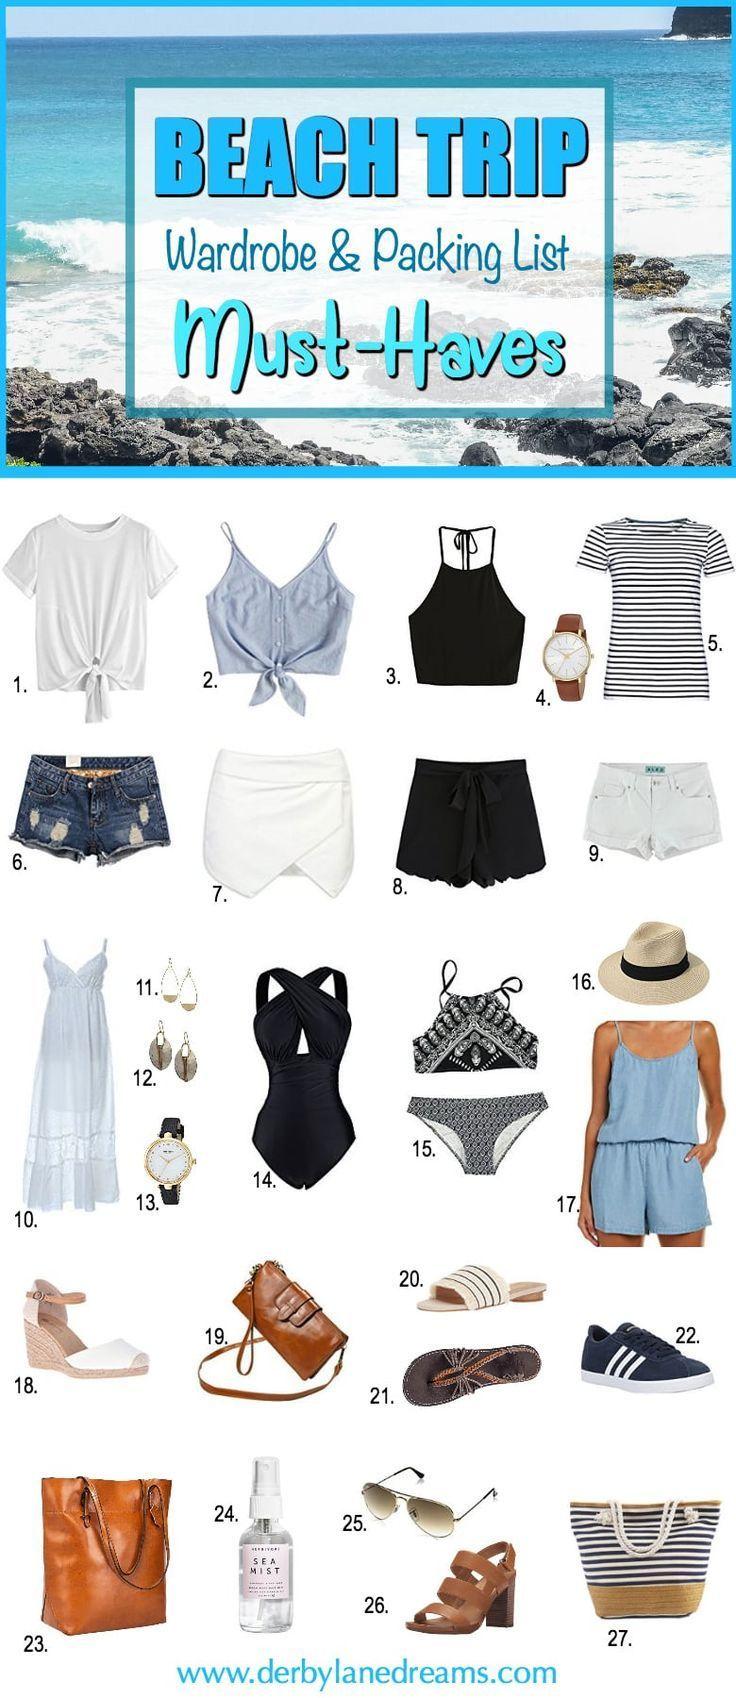 Beach Trip Wardrobe and Packing List